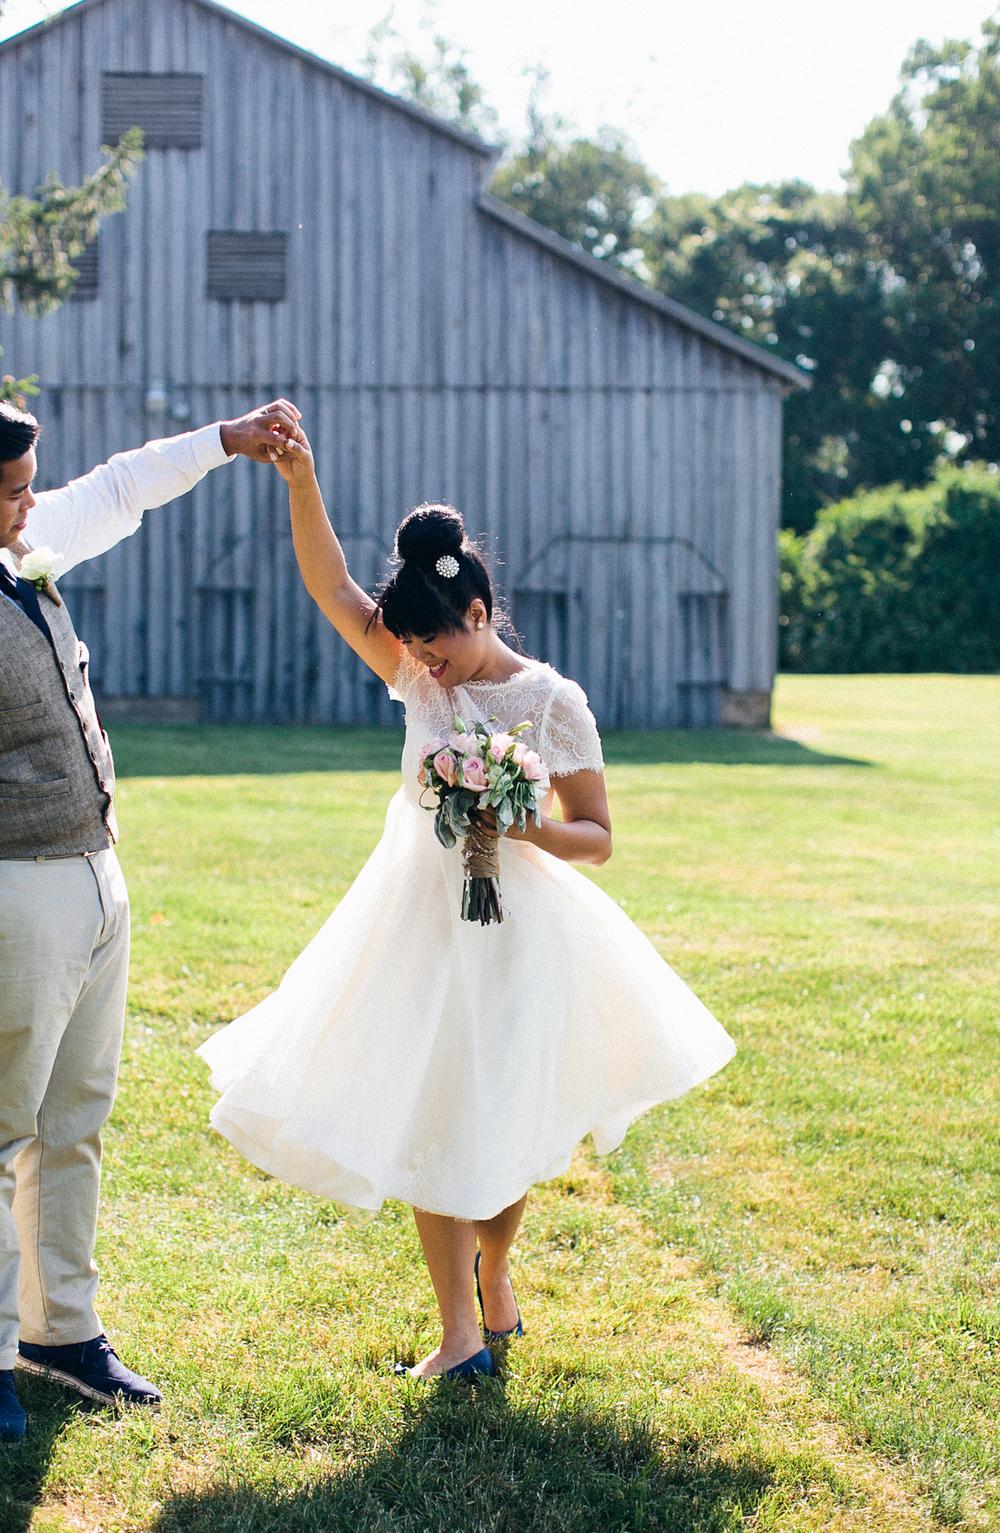 lisa_alan_billingsley_house_wedding_photography_im_kristen_maryland155of216.jpg~original.jpeg